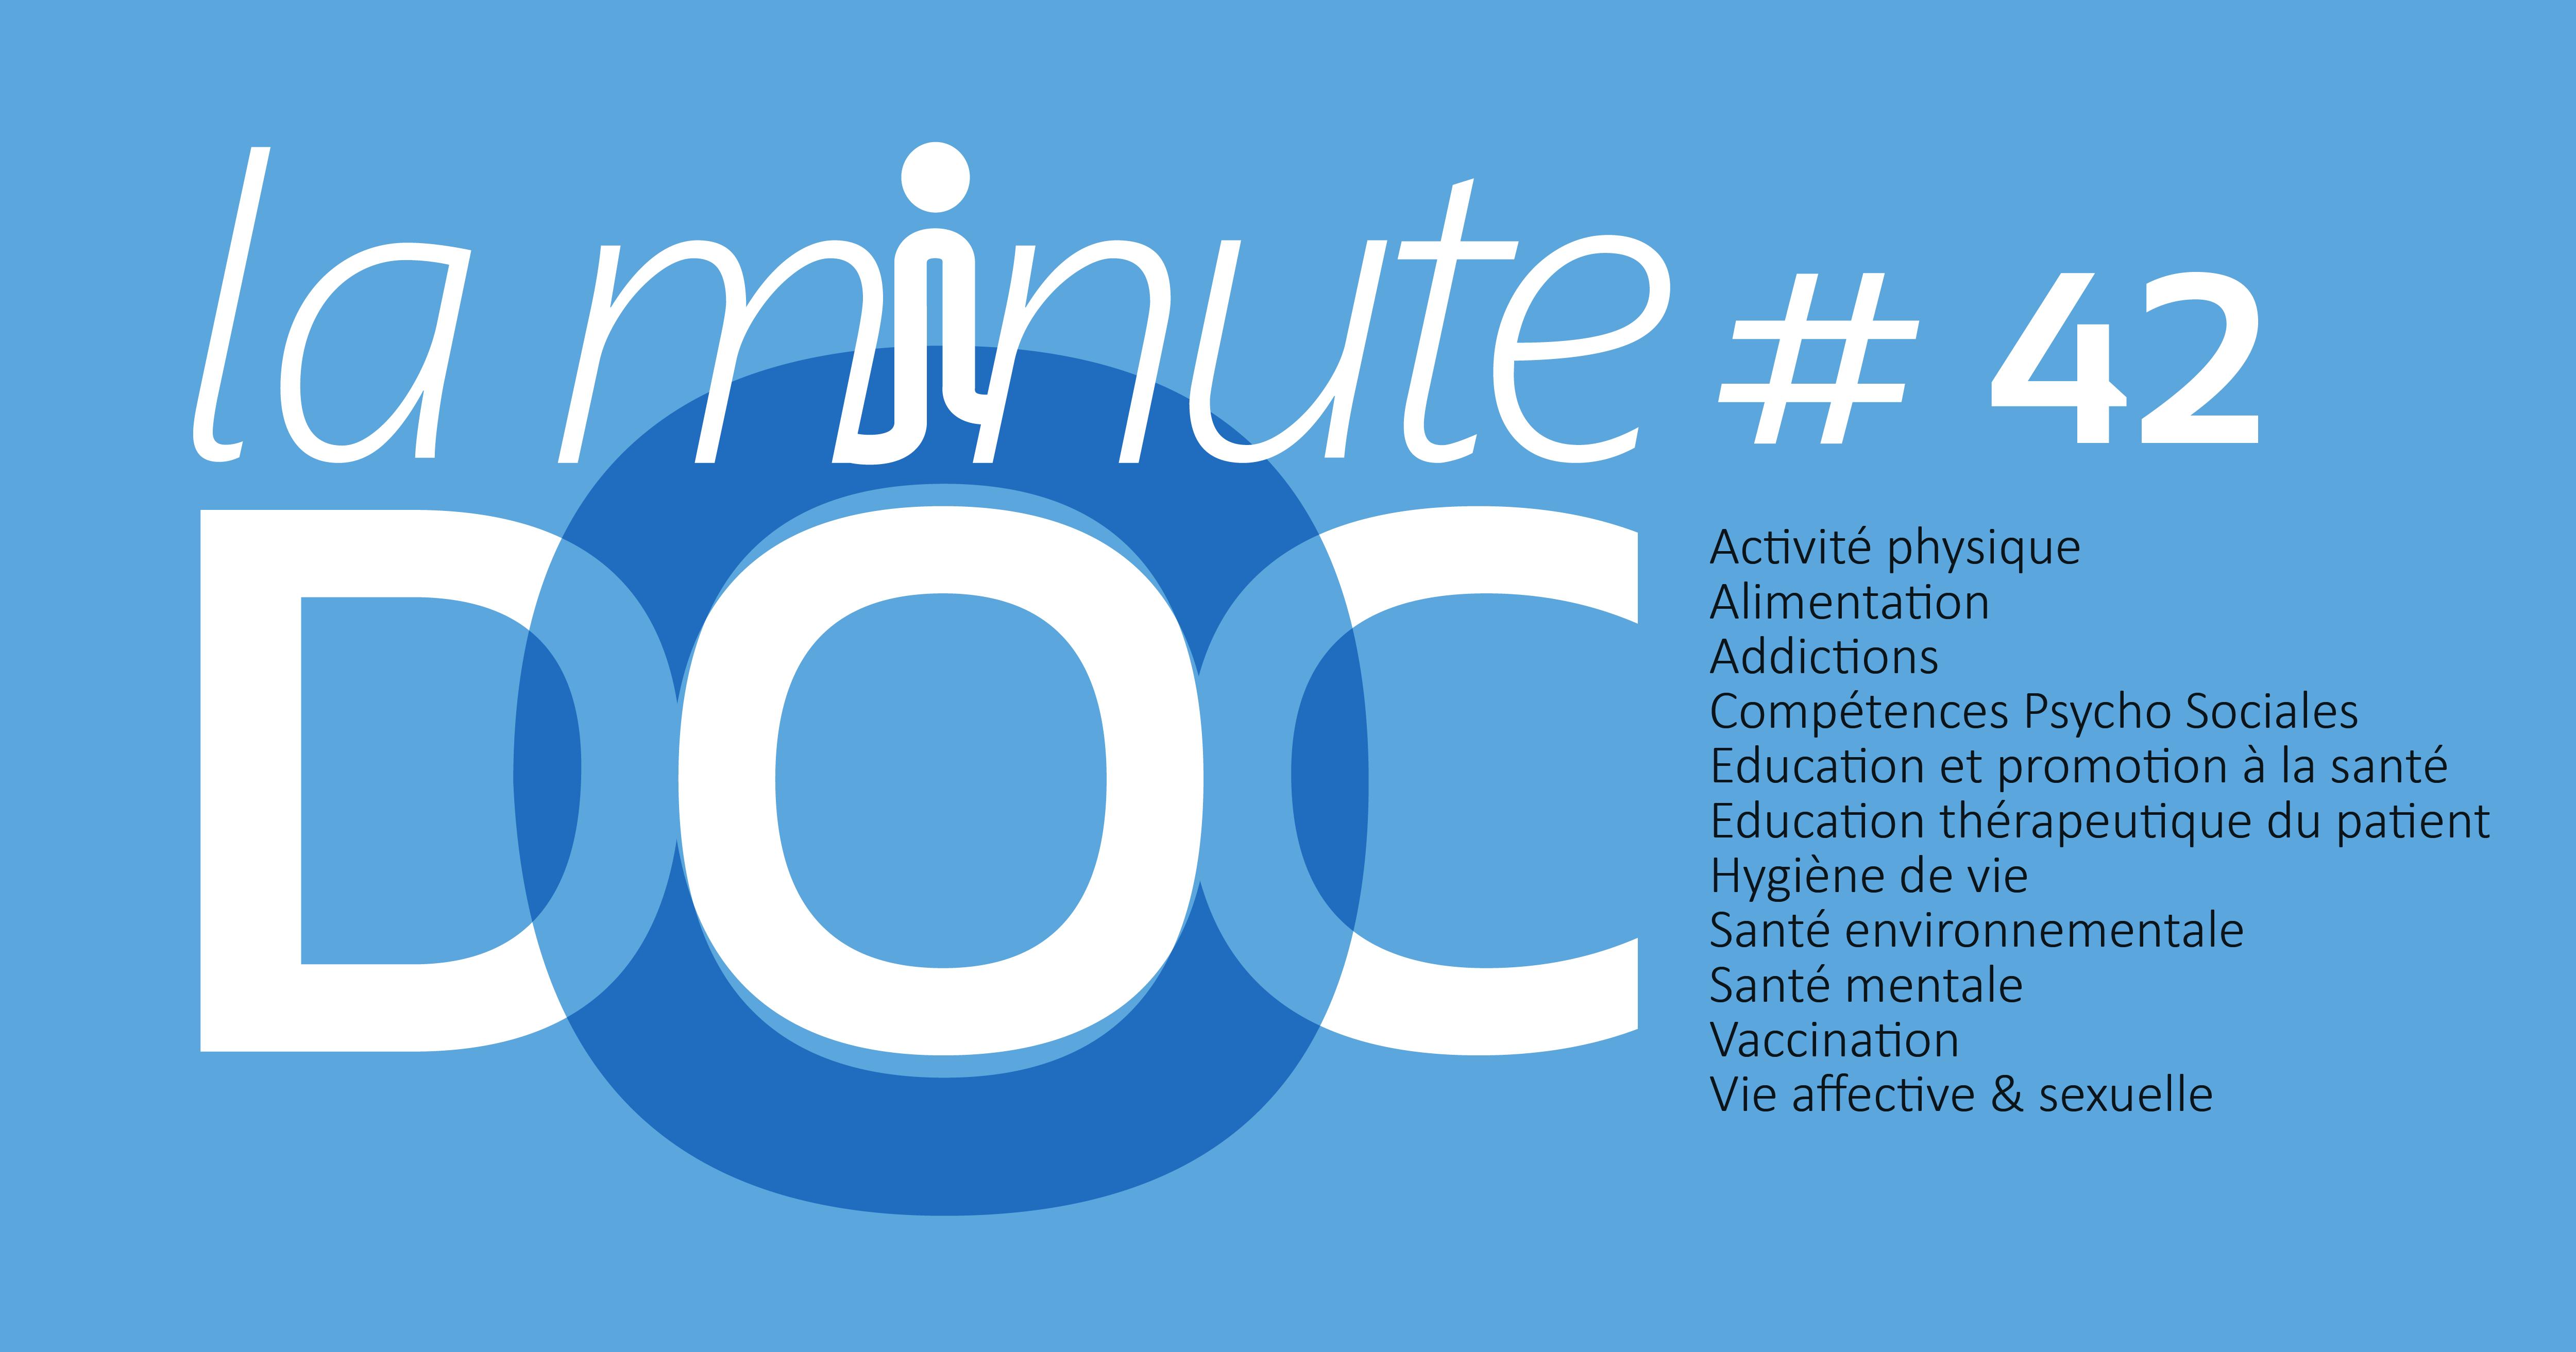 la minute DOC #42